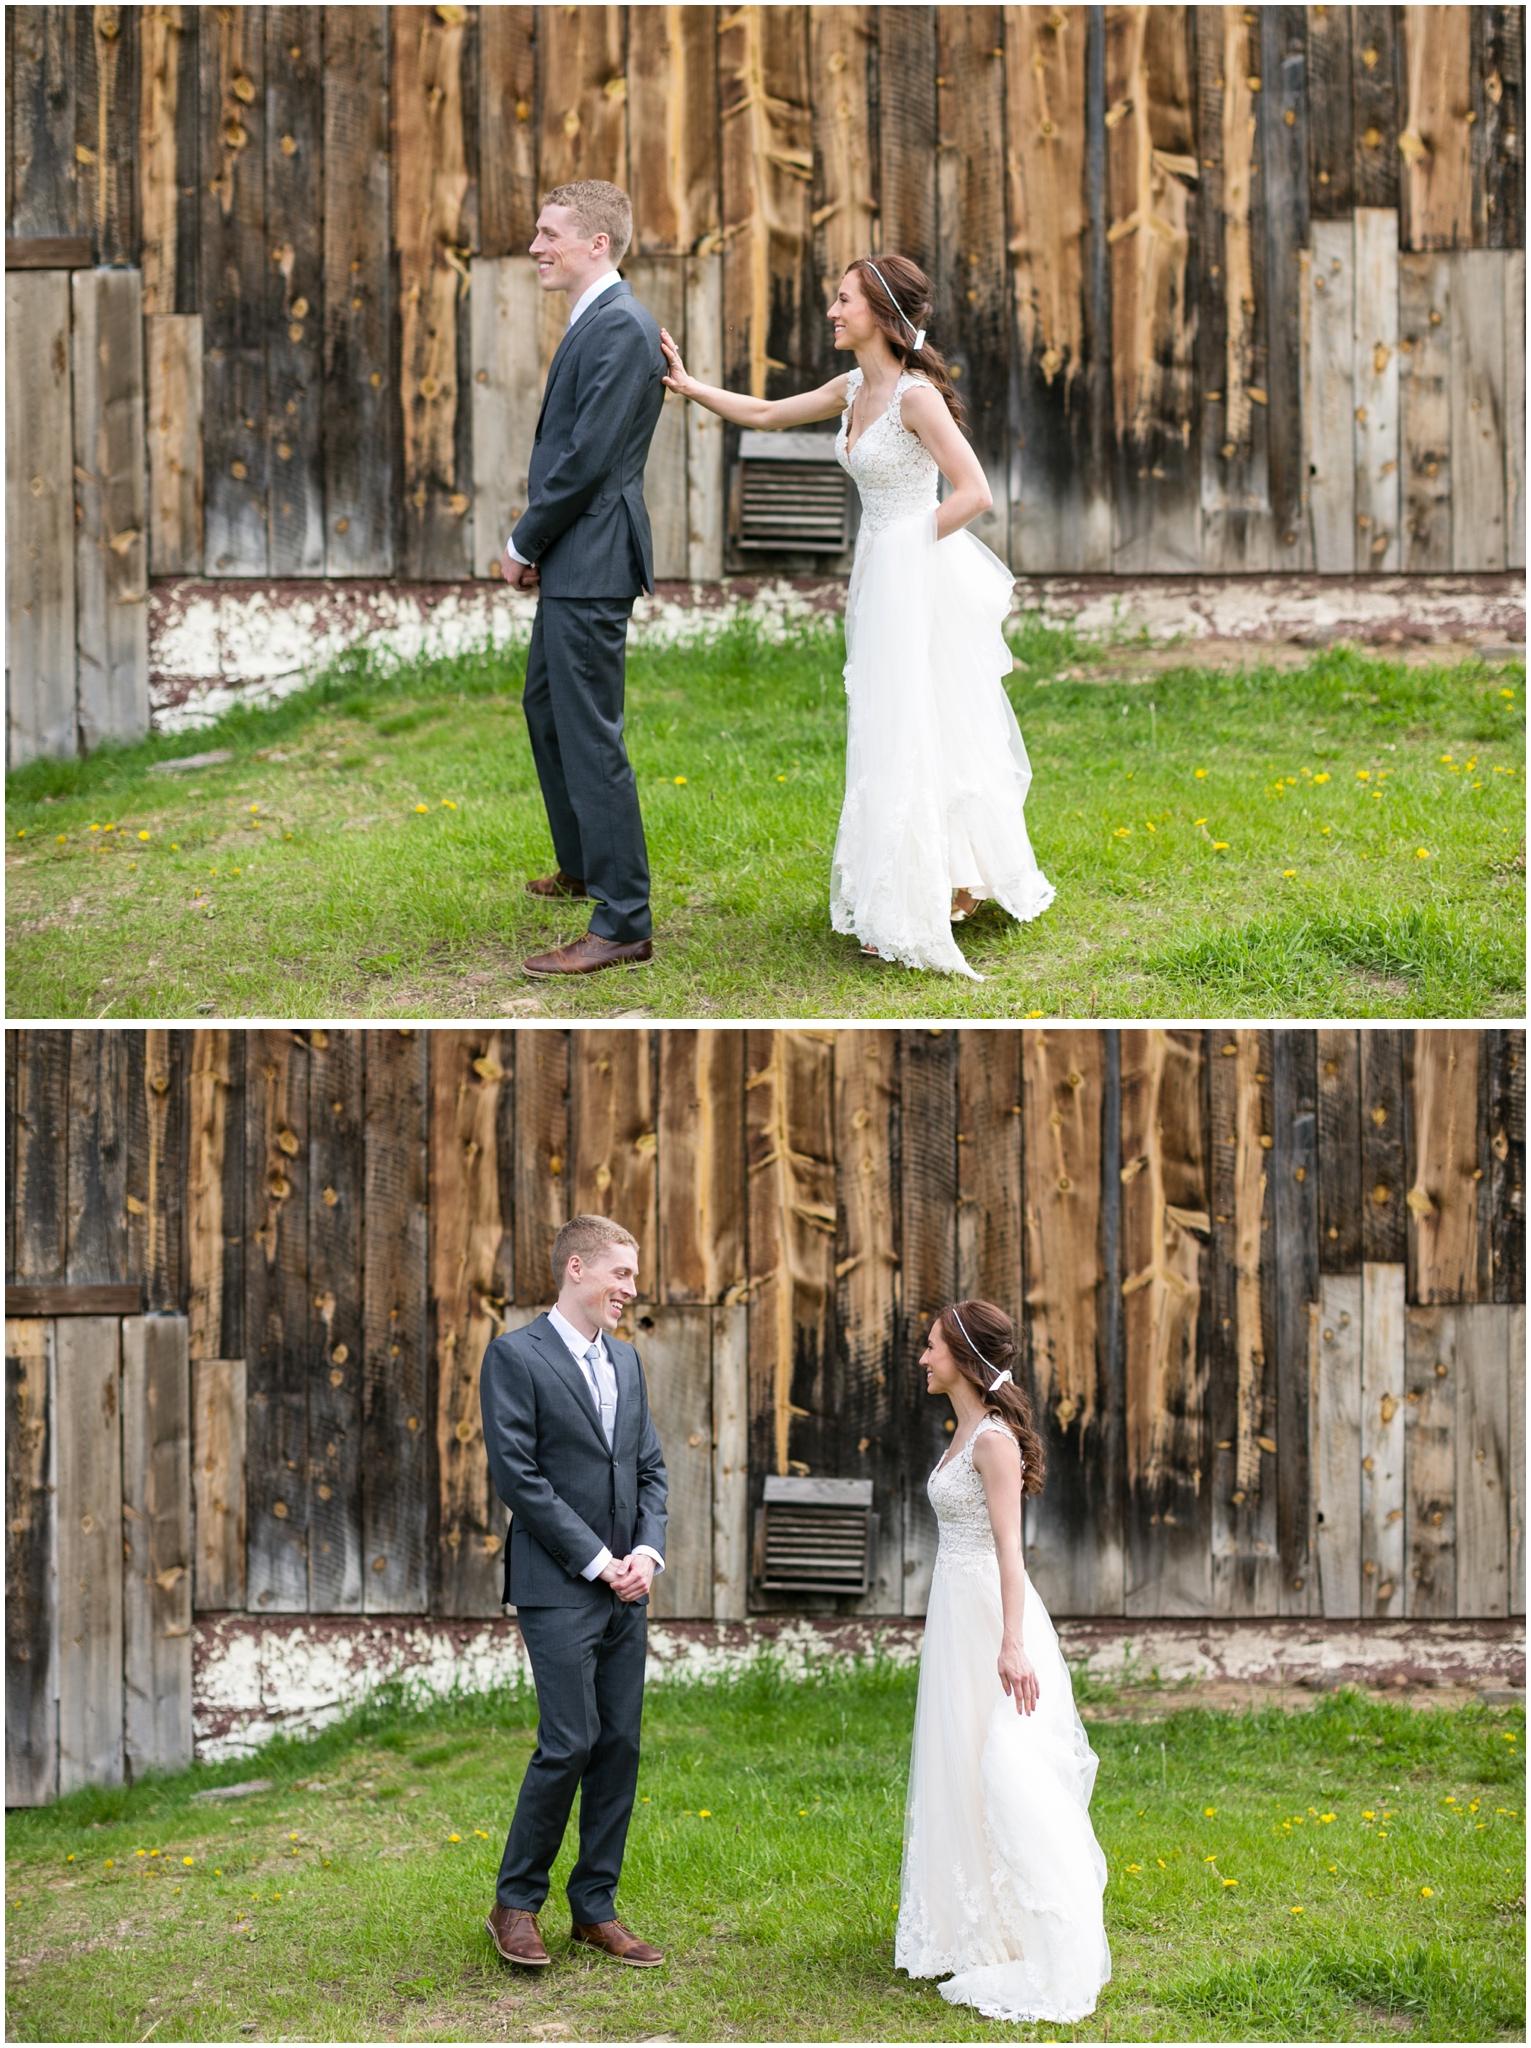 Evergreen_Lake_house_Wedding_Photographer_First_Look.JPG